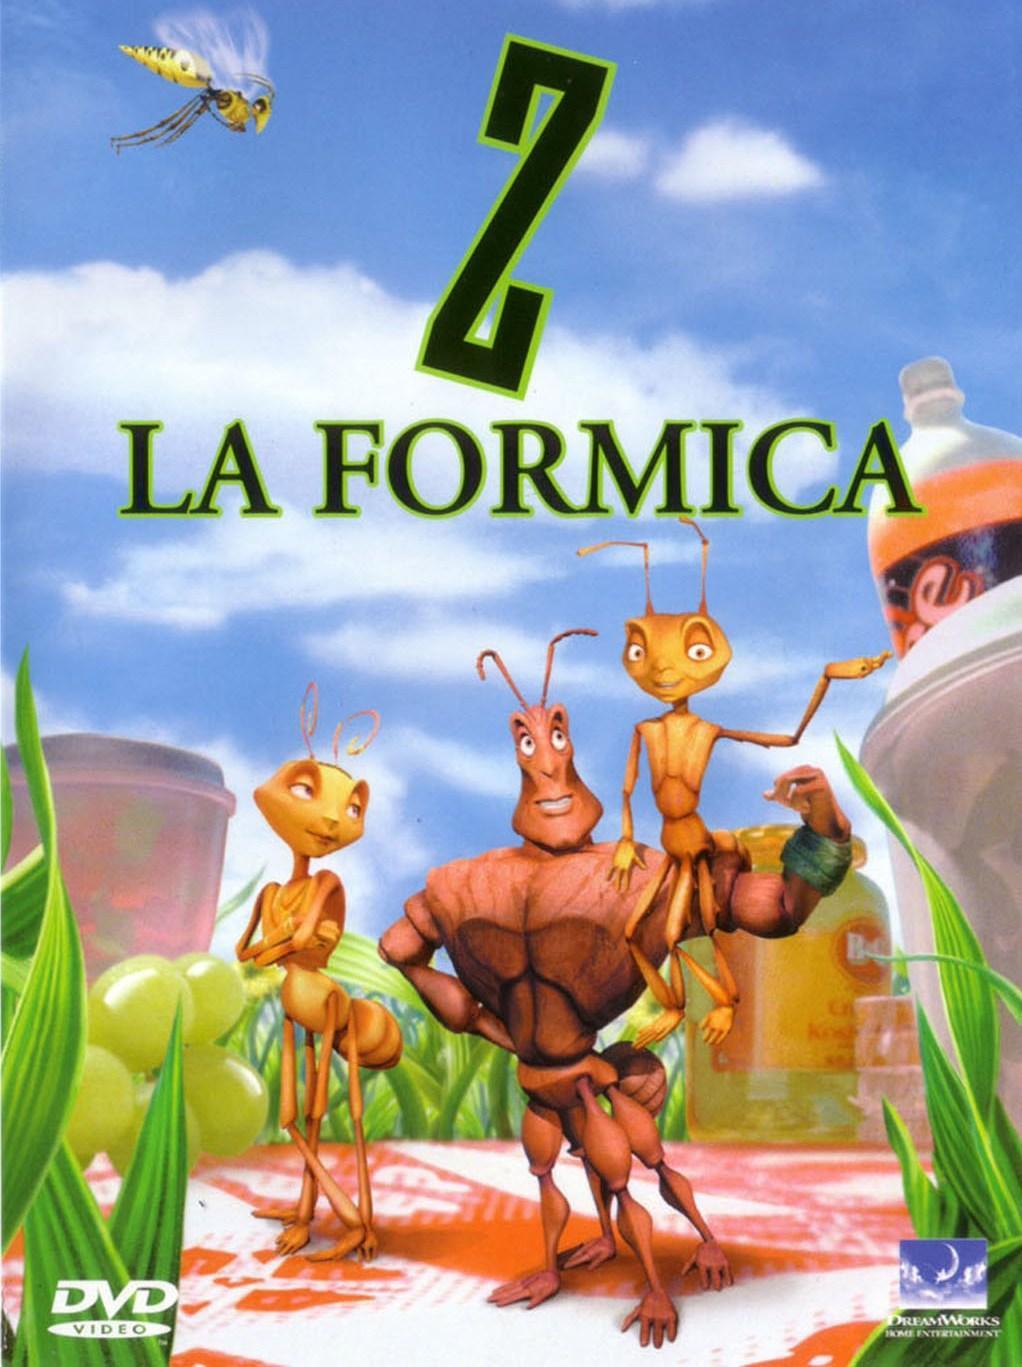 Cat film zeta la formica antz